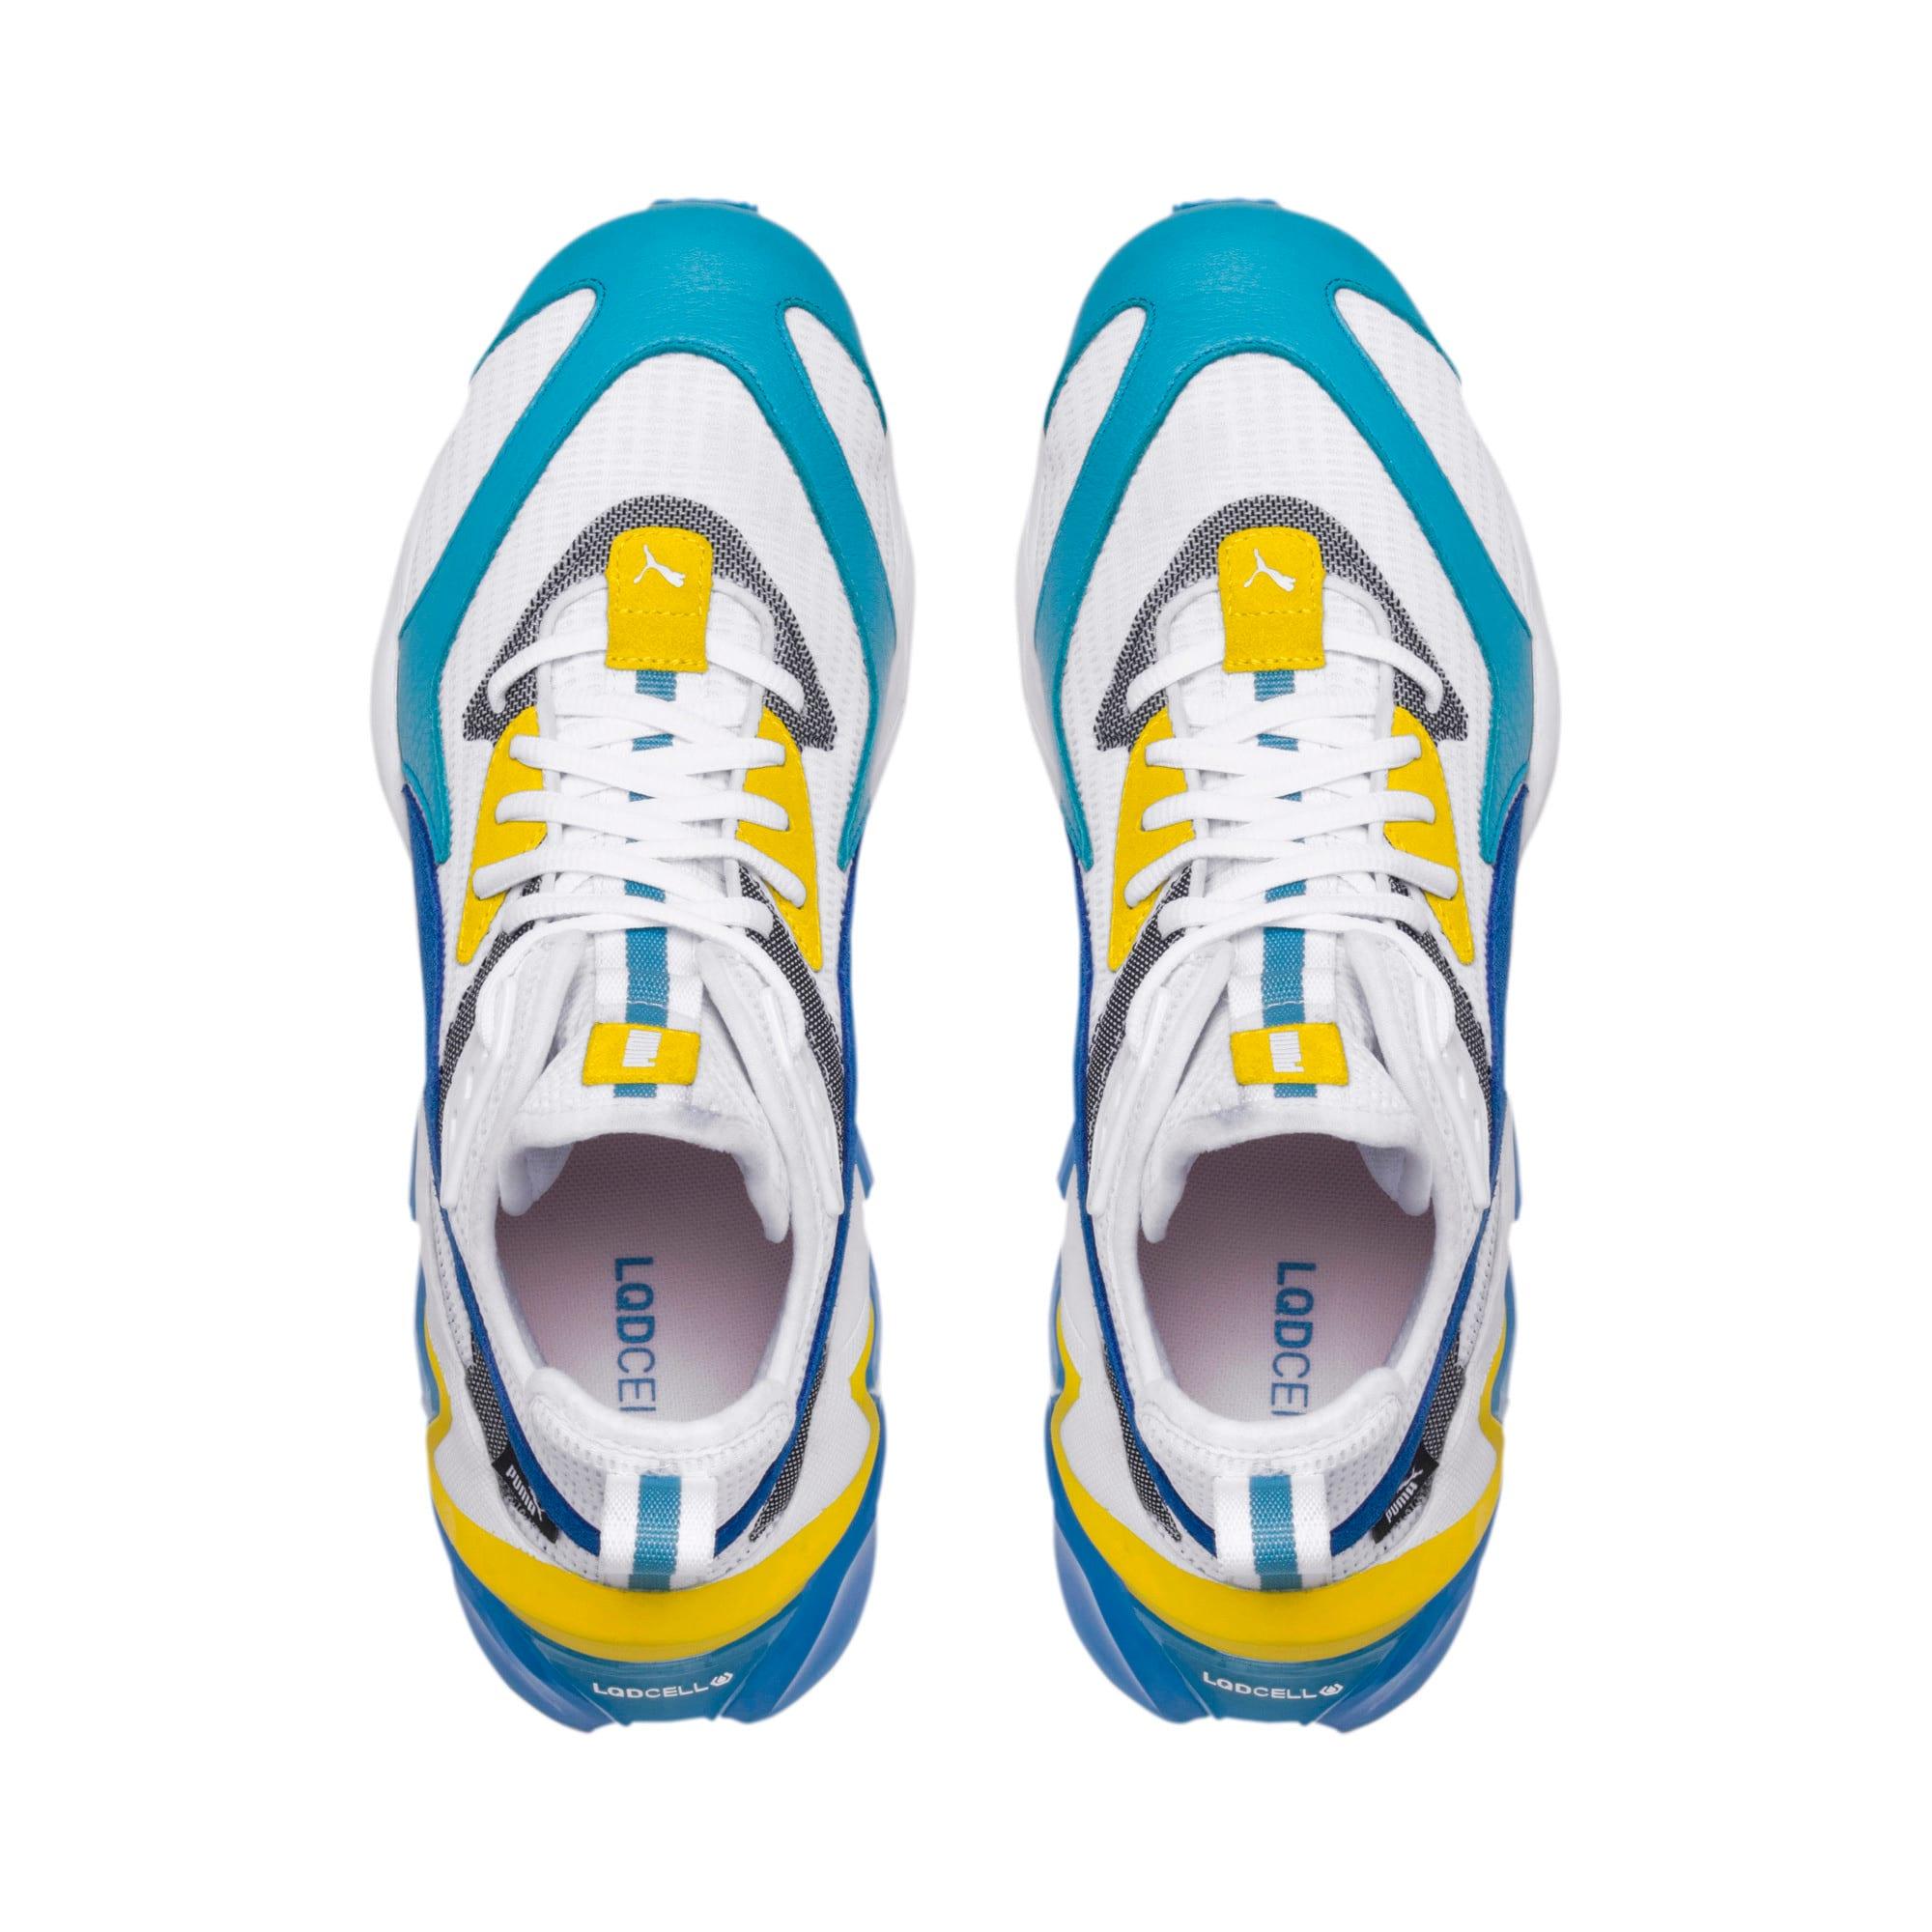 Thumbnail 6 of LQDCELL Origin Herren Sneaker, Puma White-B Blue-Blz Yellow, medium